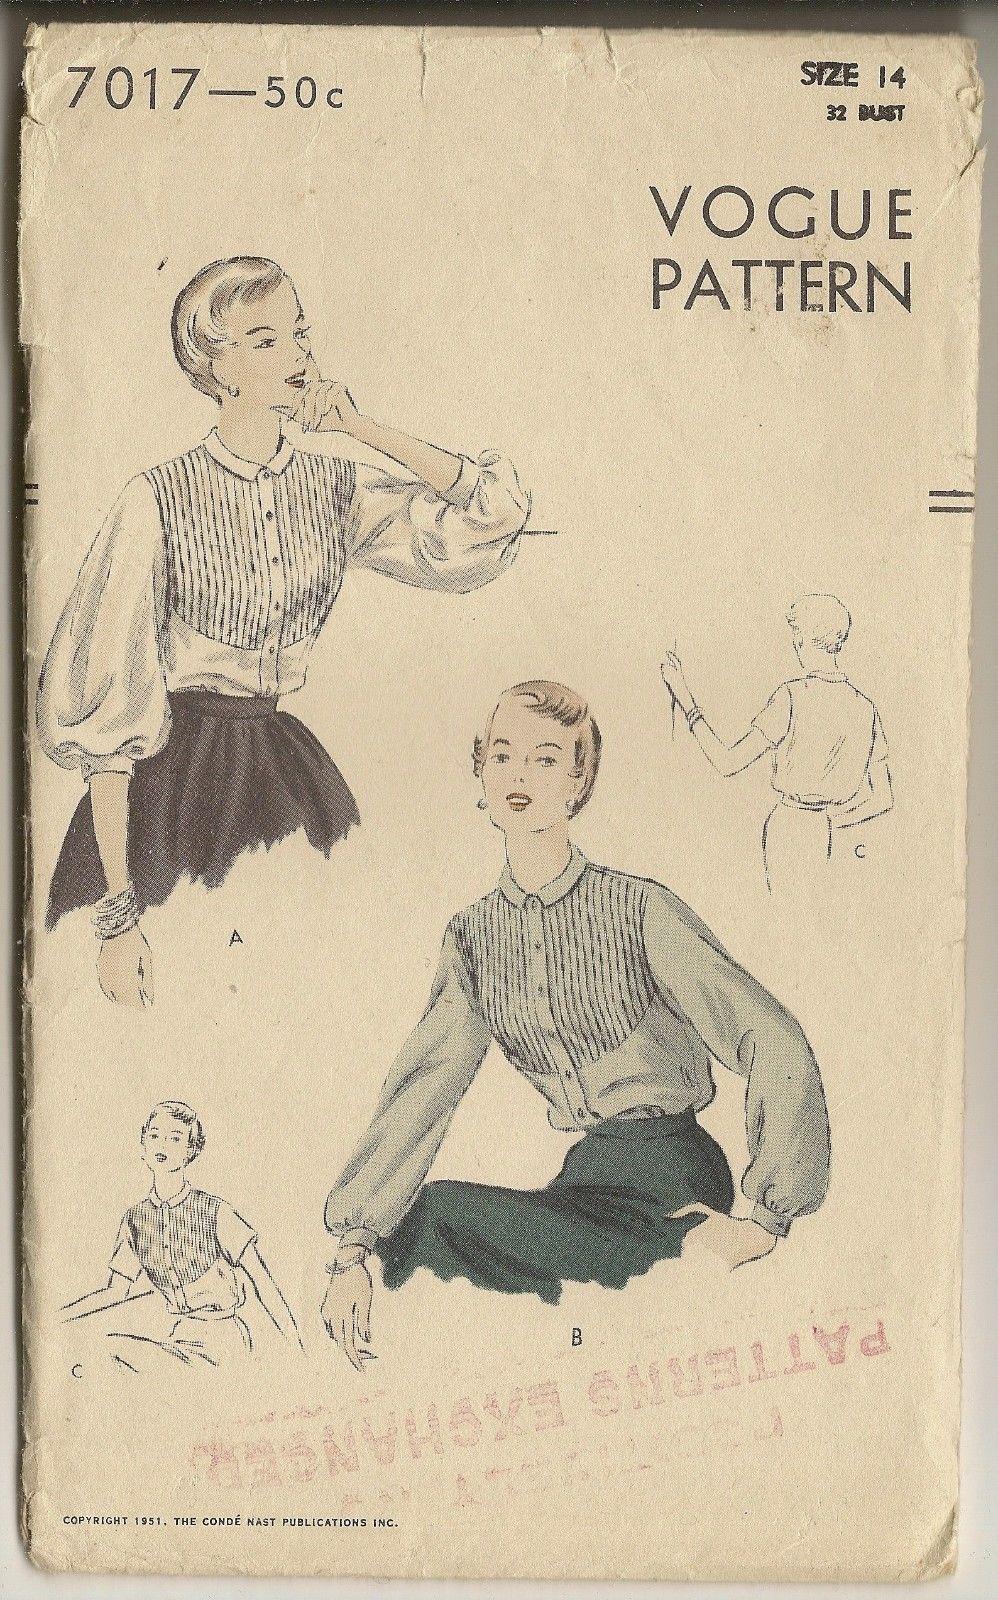 Vogue 7017 (1950) | Vintage Sewing Patterns Community Board | Pinterest